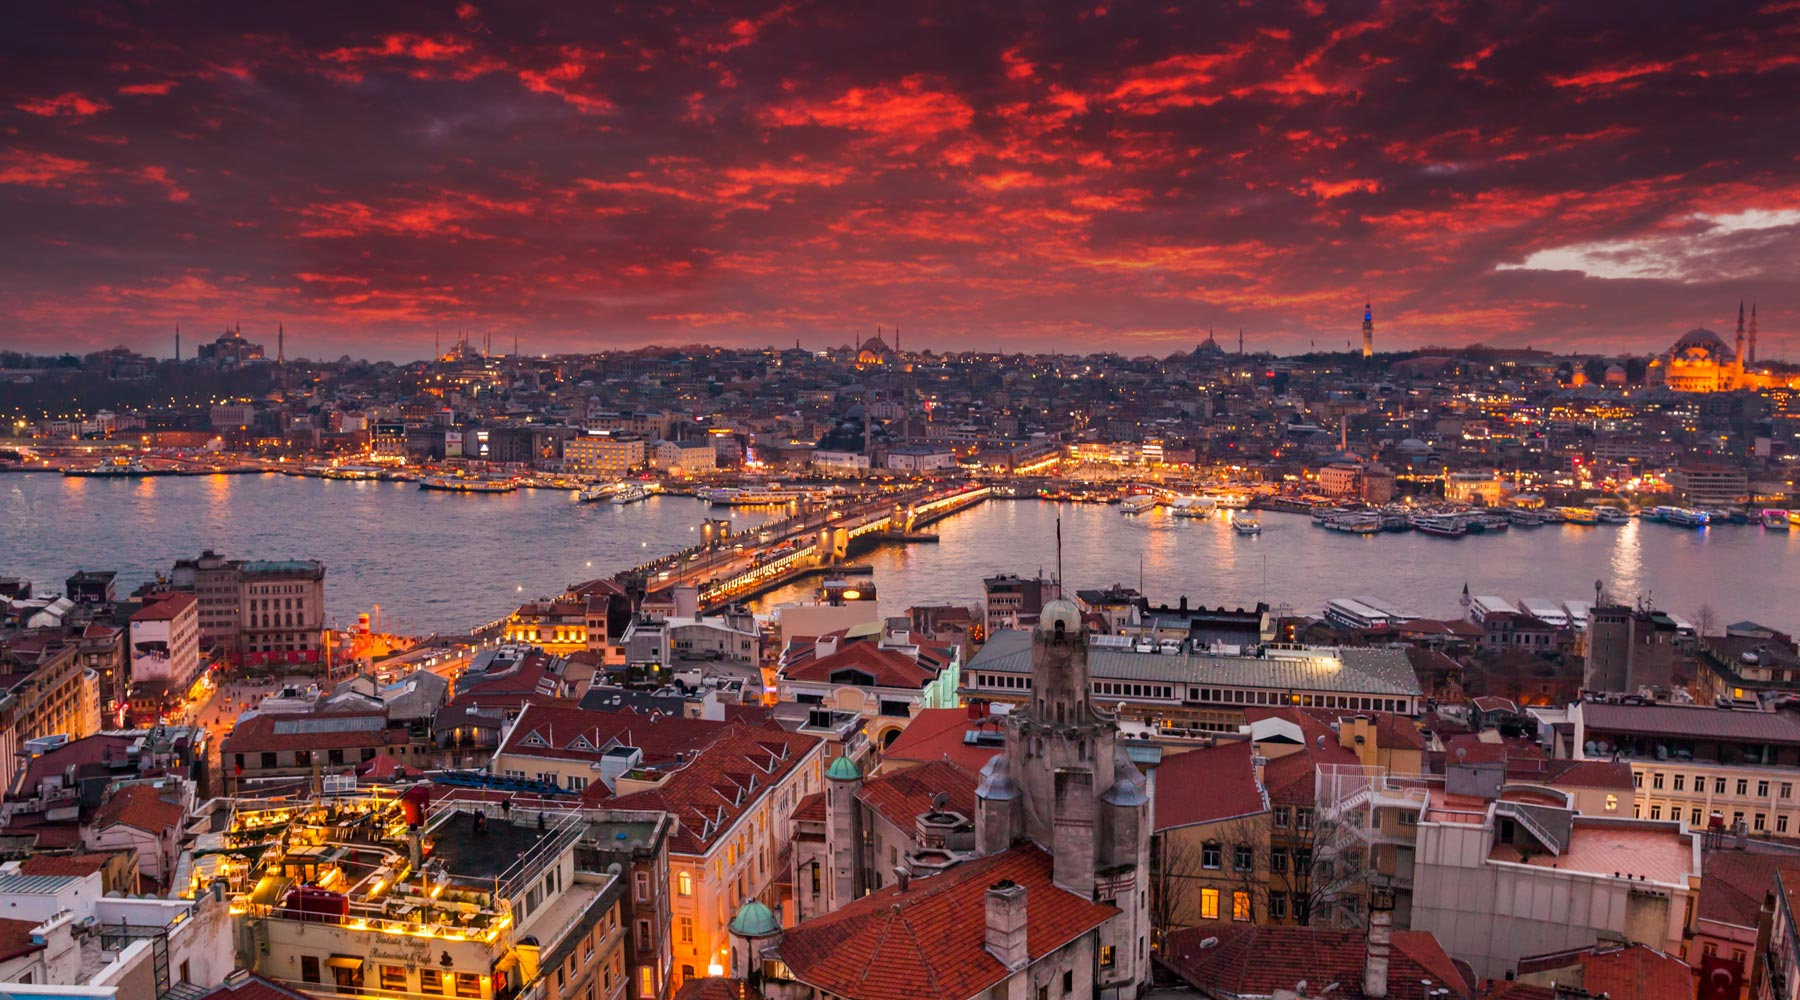 Galata Bridge – The Most Famous Bridge in Istanbul (Golden Horn)